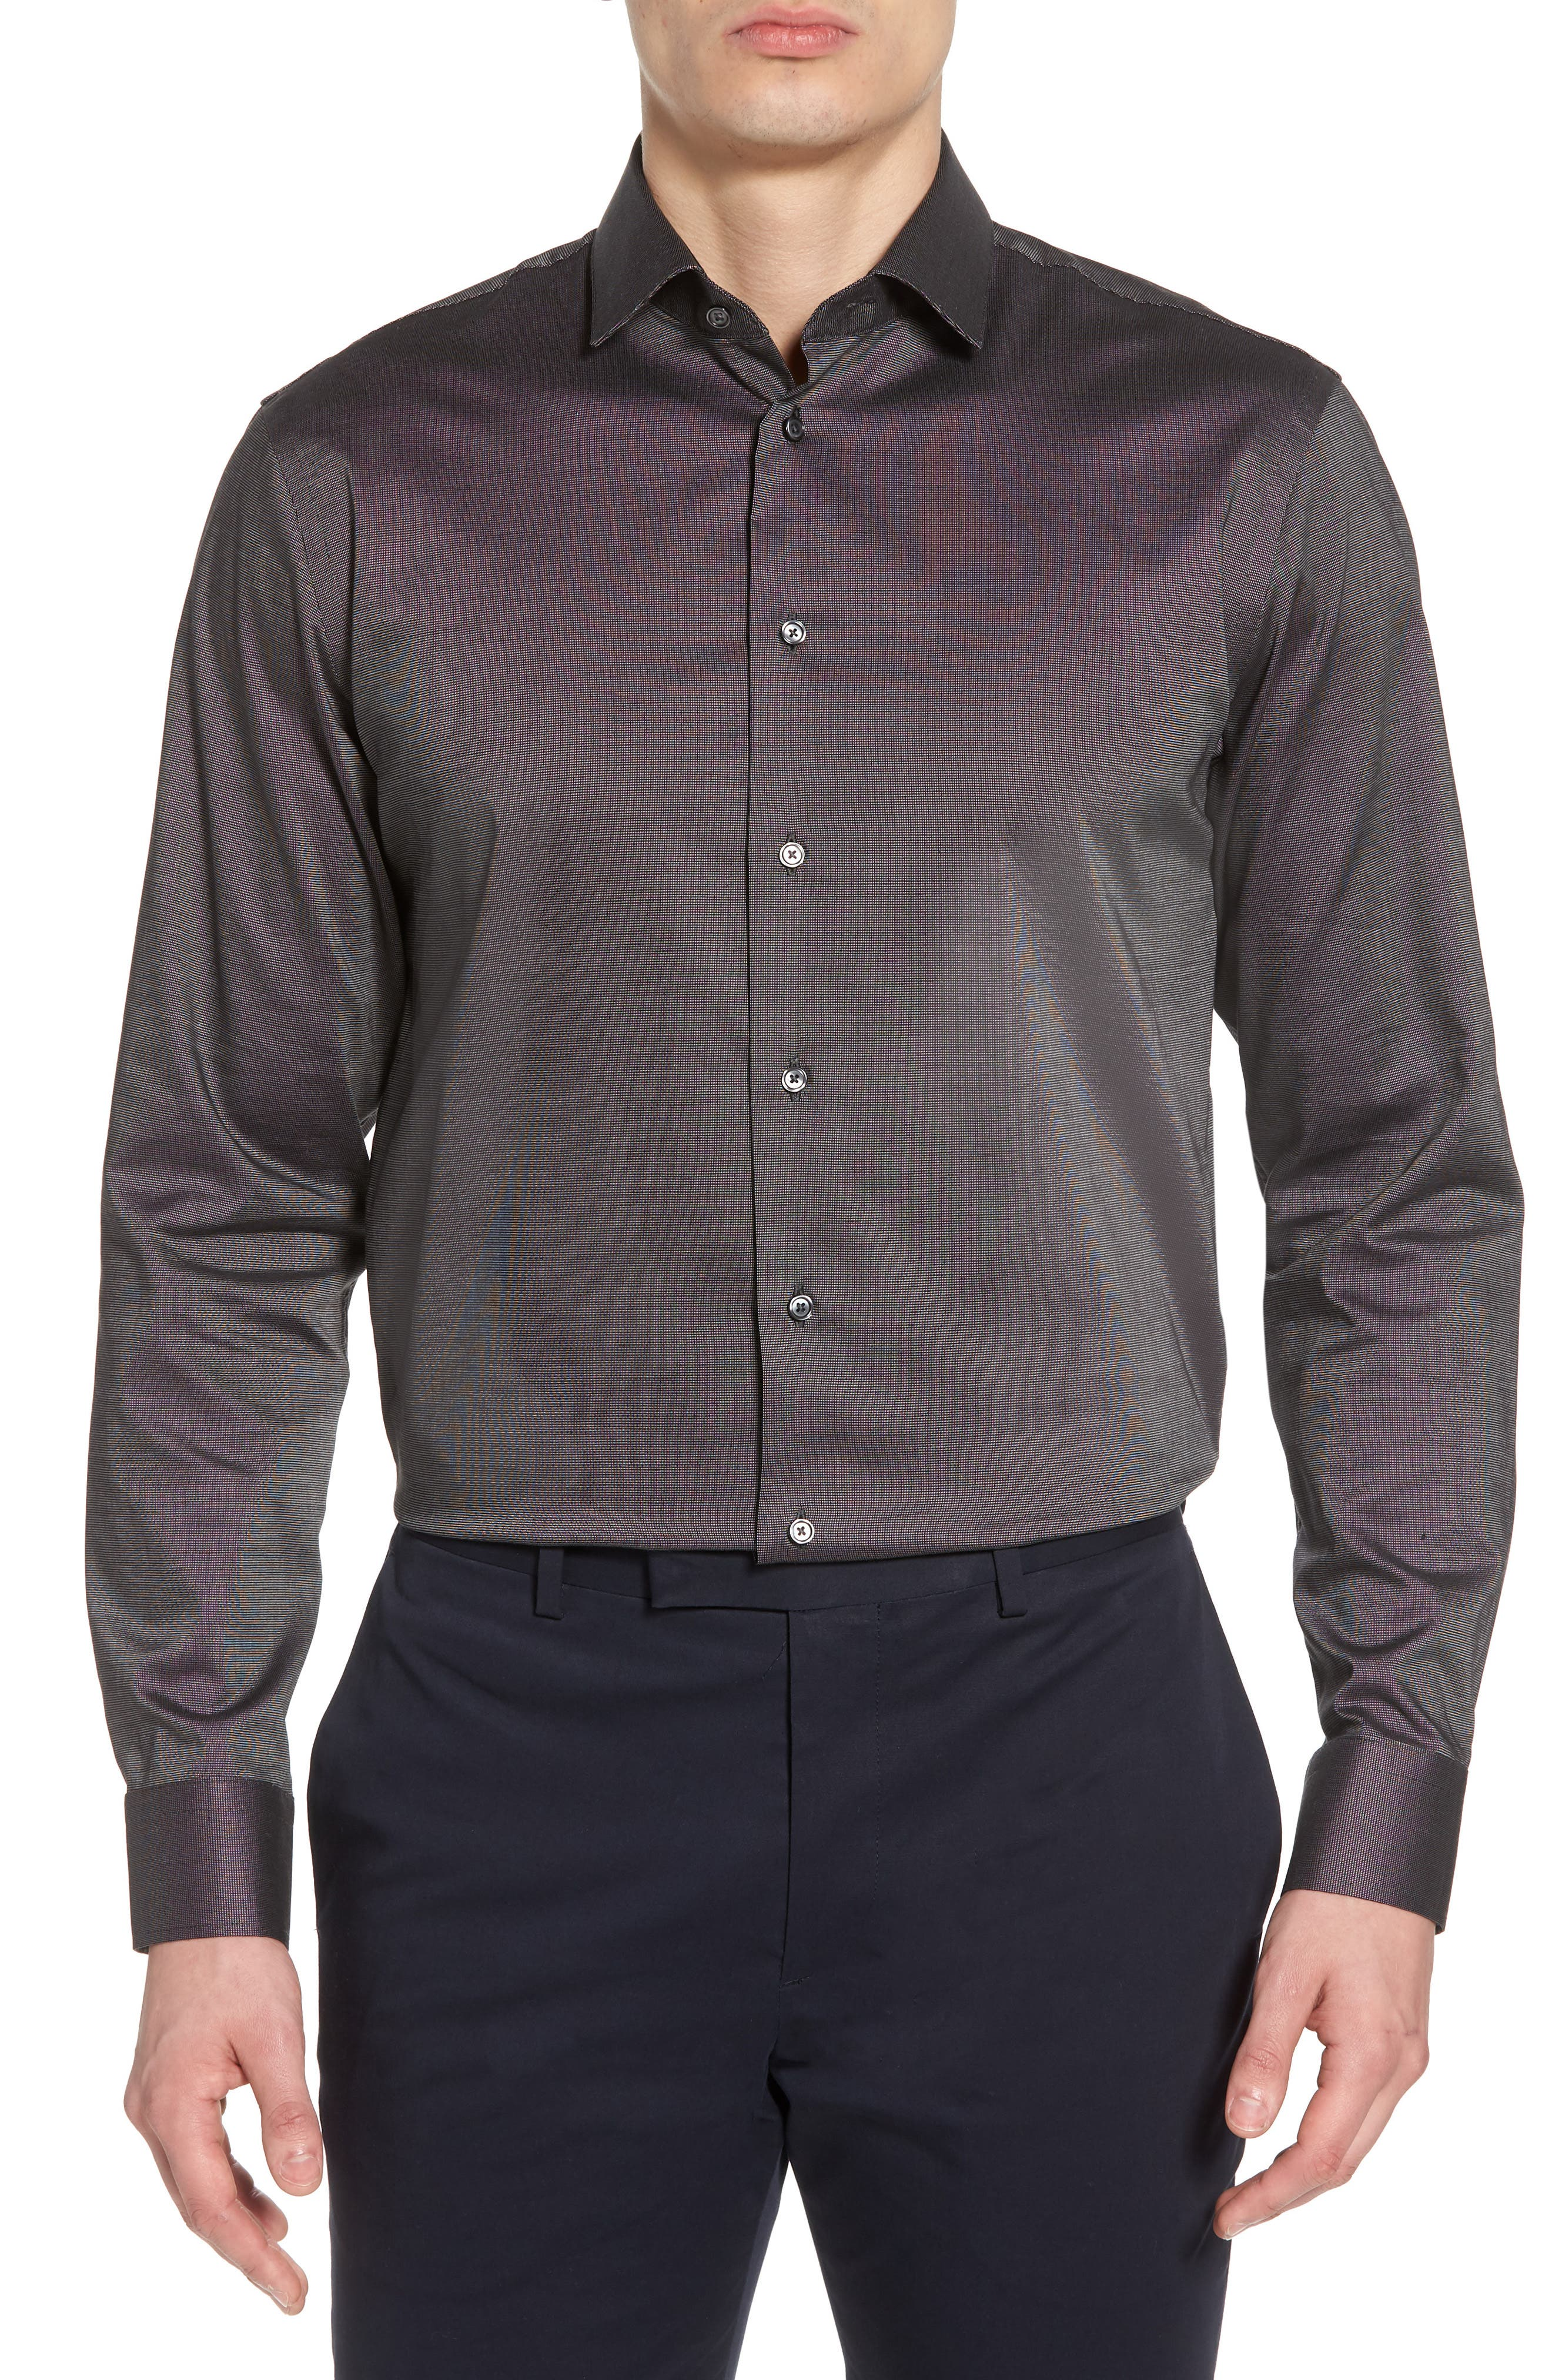 Main Image - Calibrate Trim Fit Stretch Solid Dress Shirt